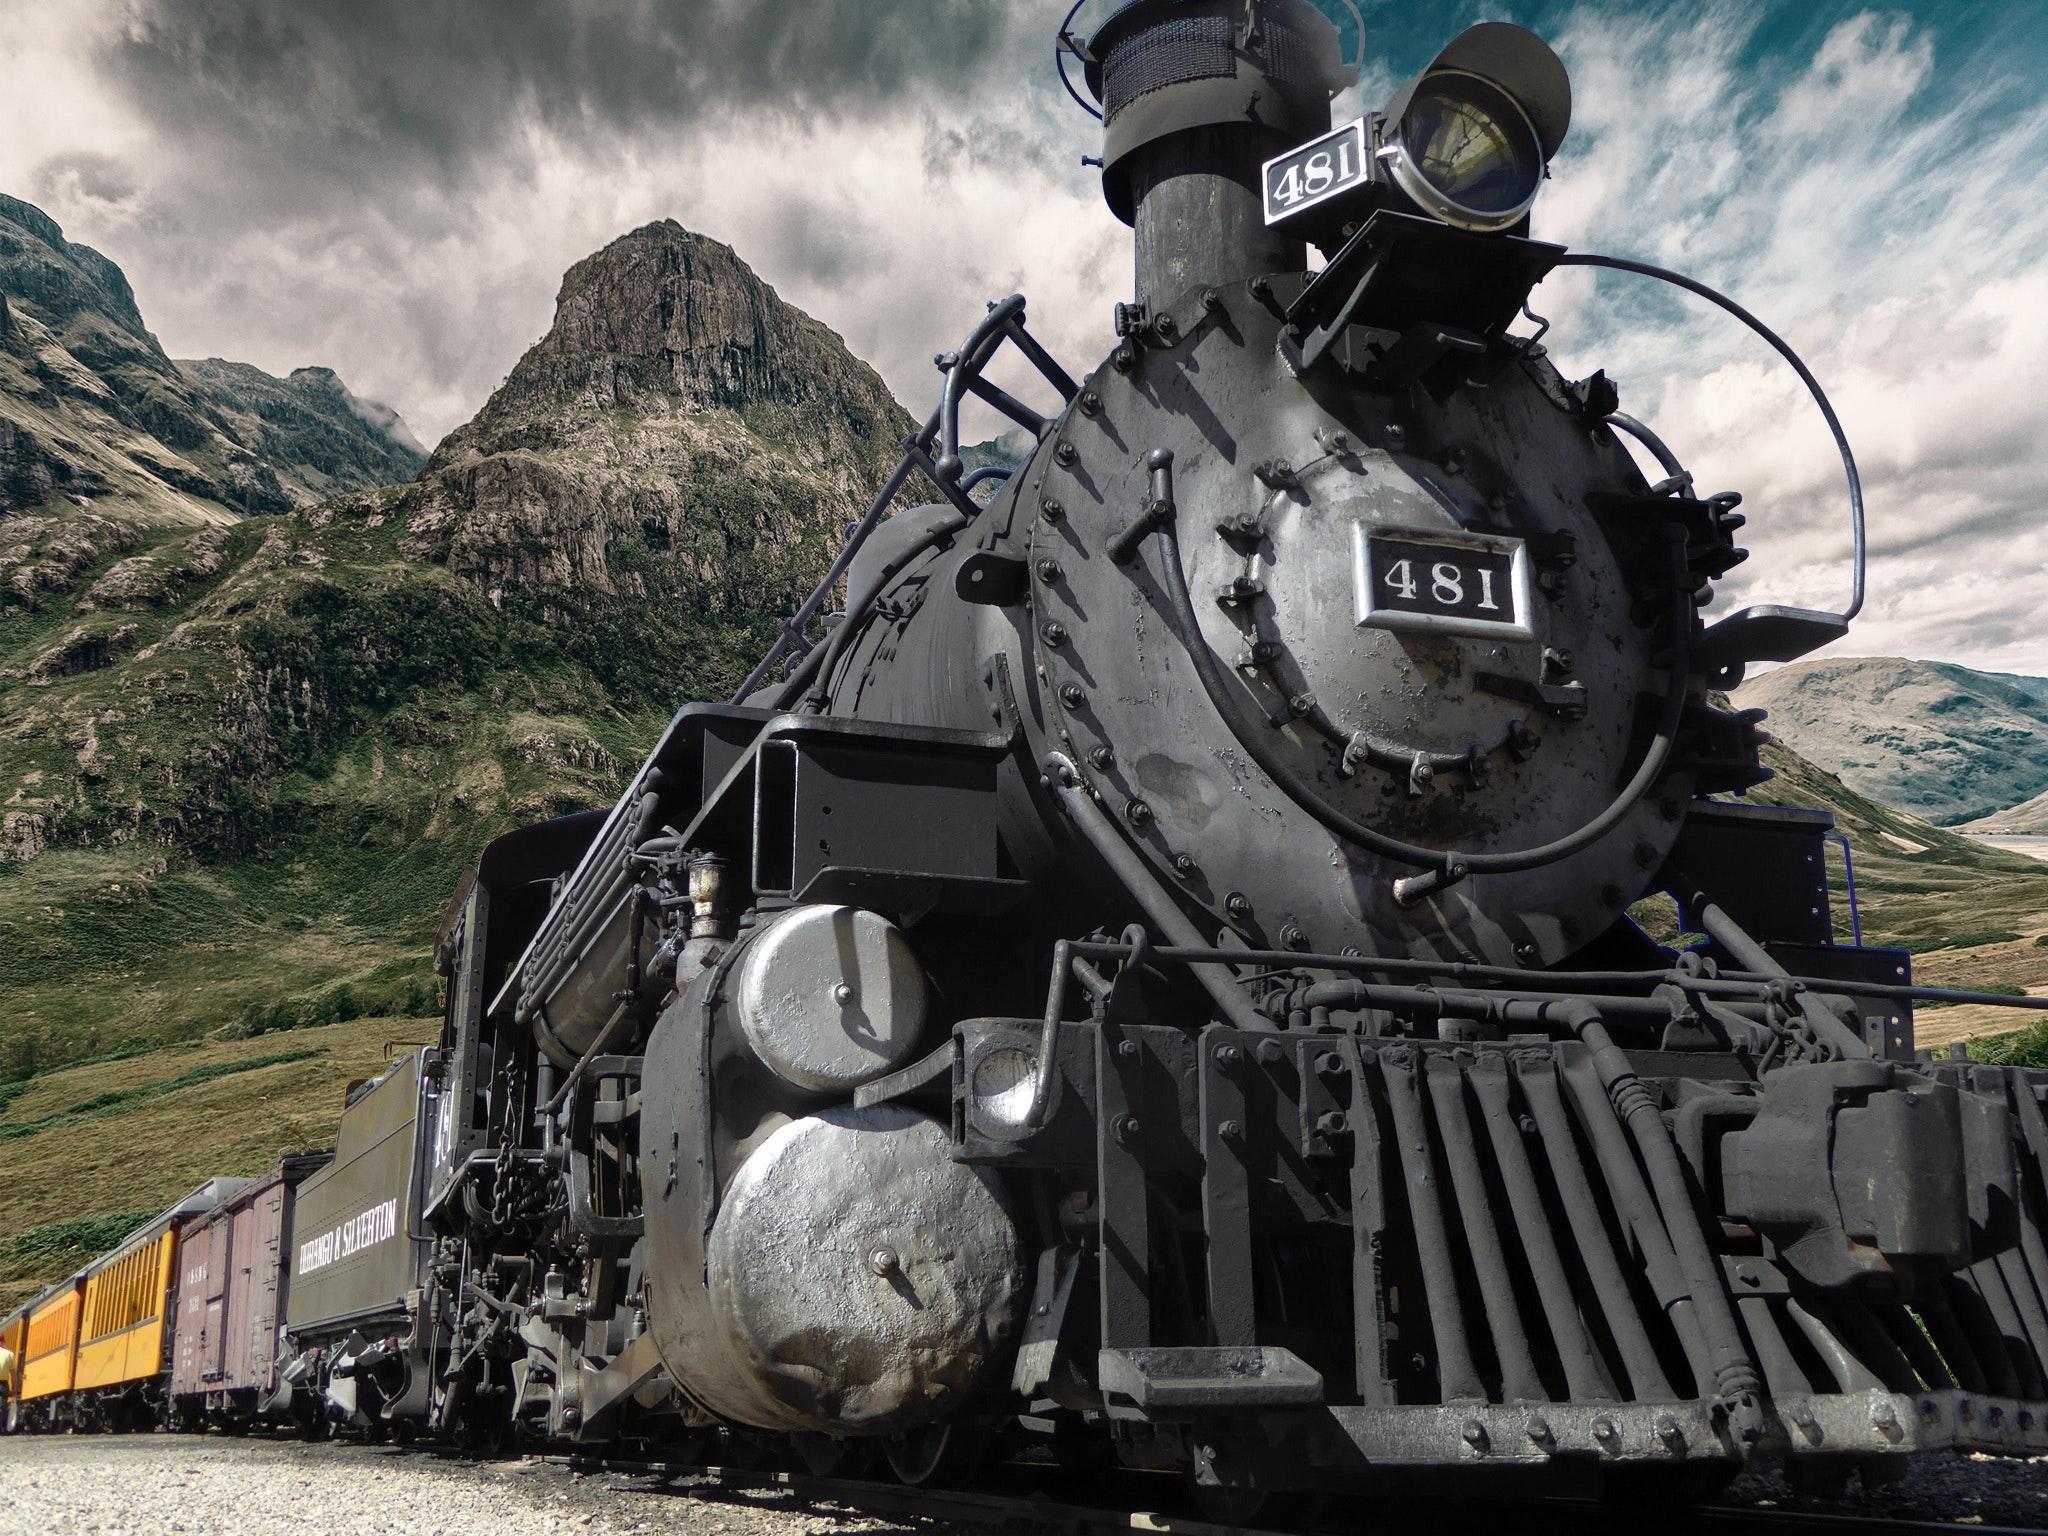 237 interesting train images pexels free stock photos